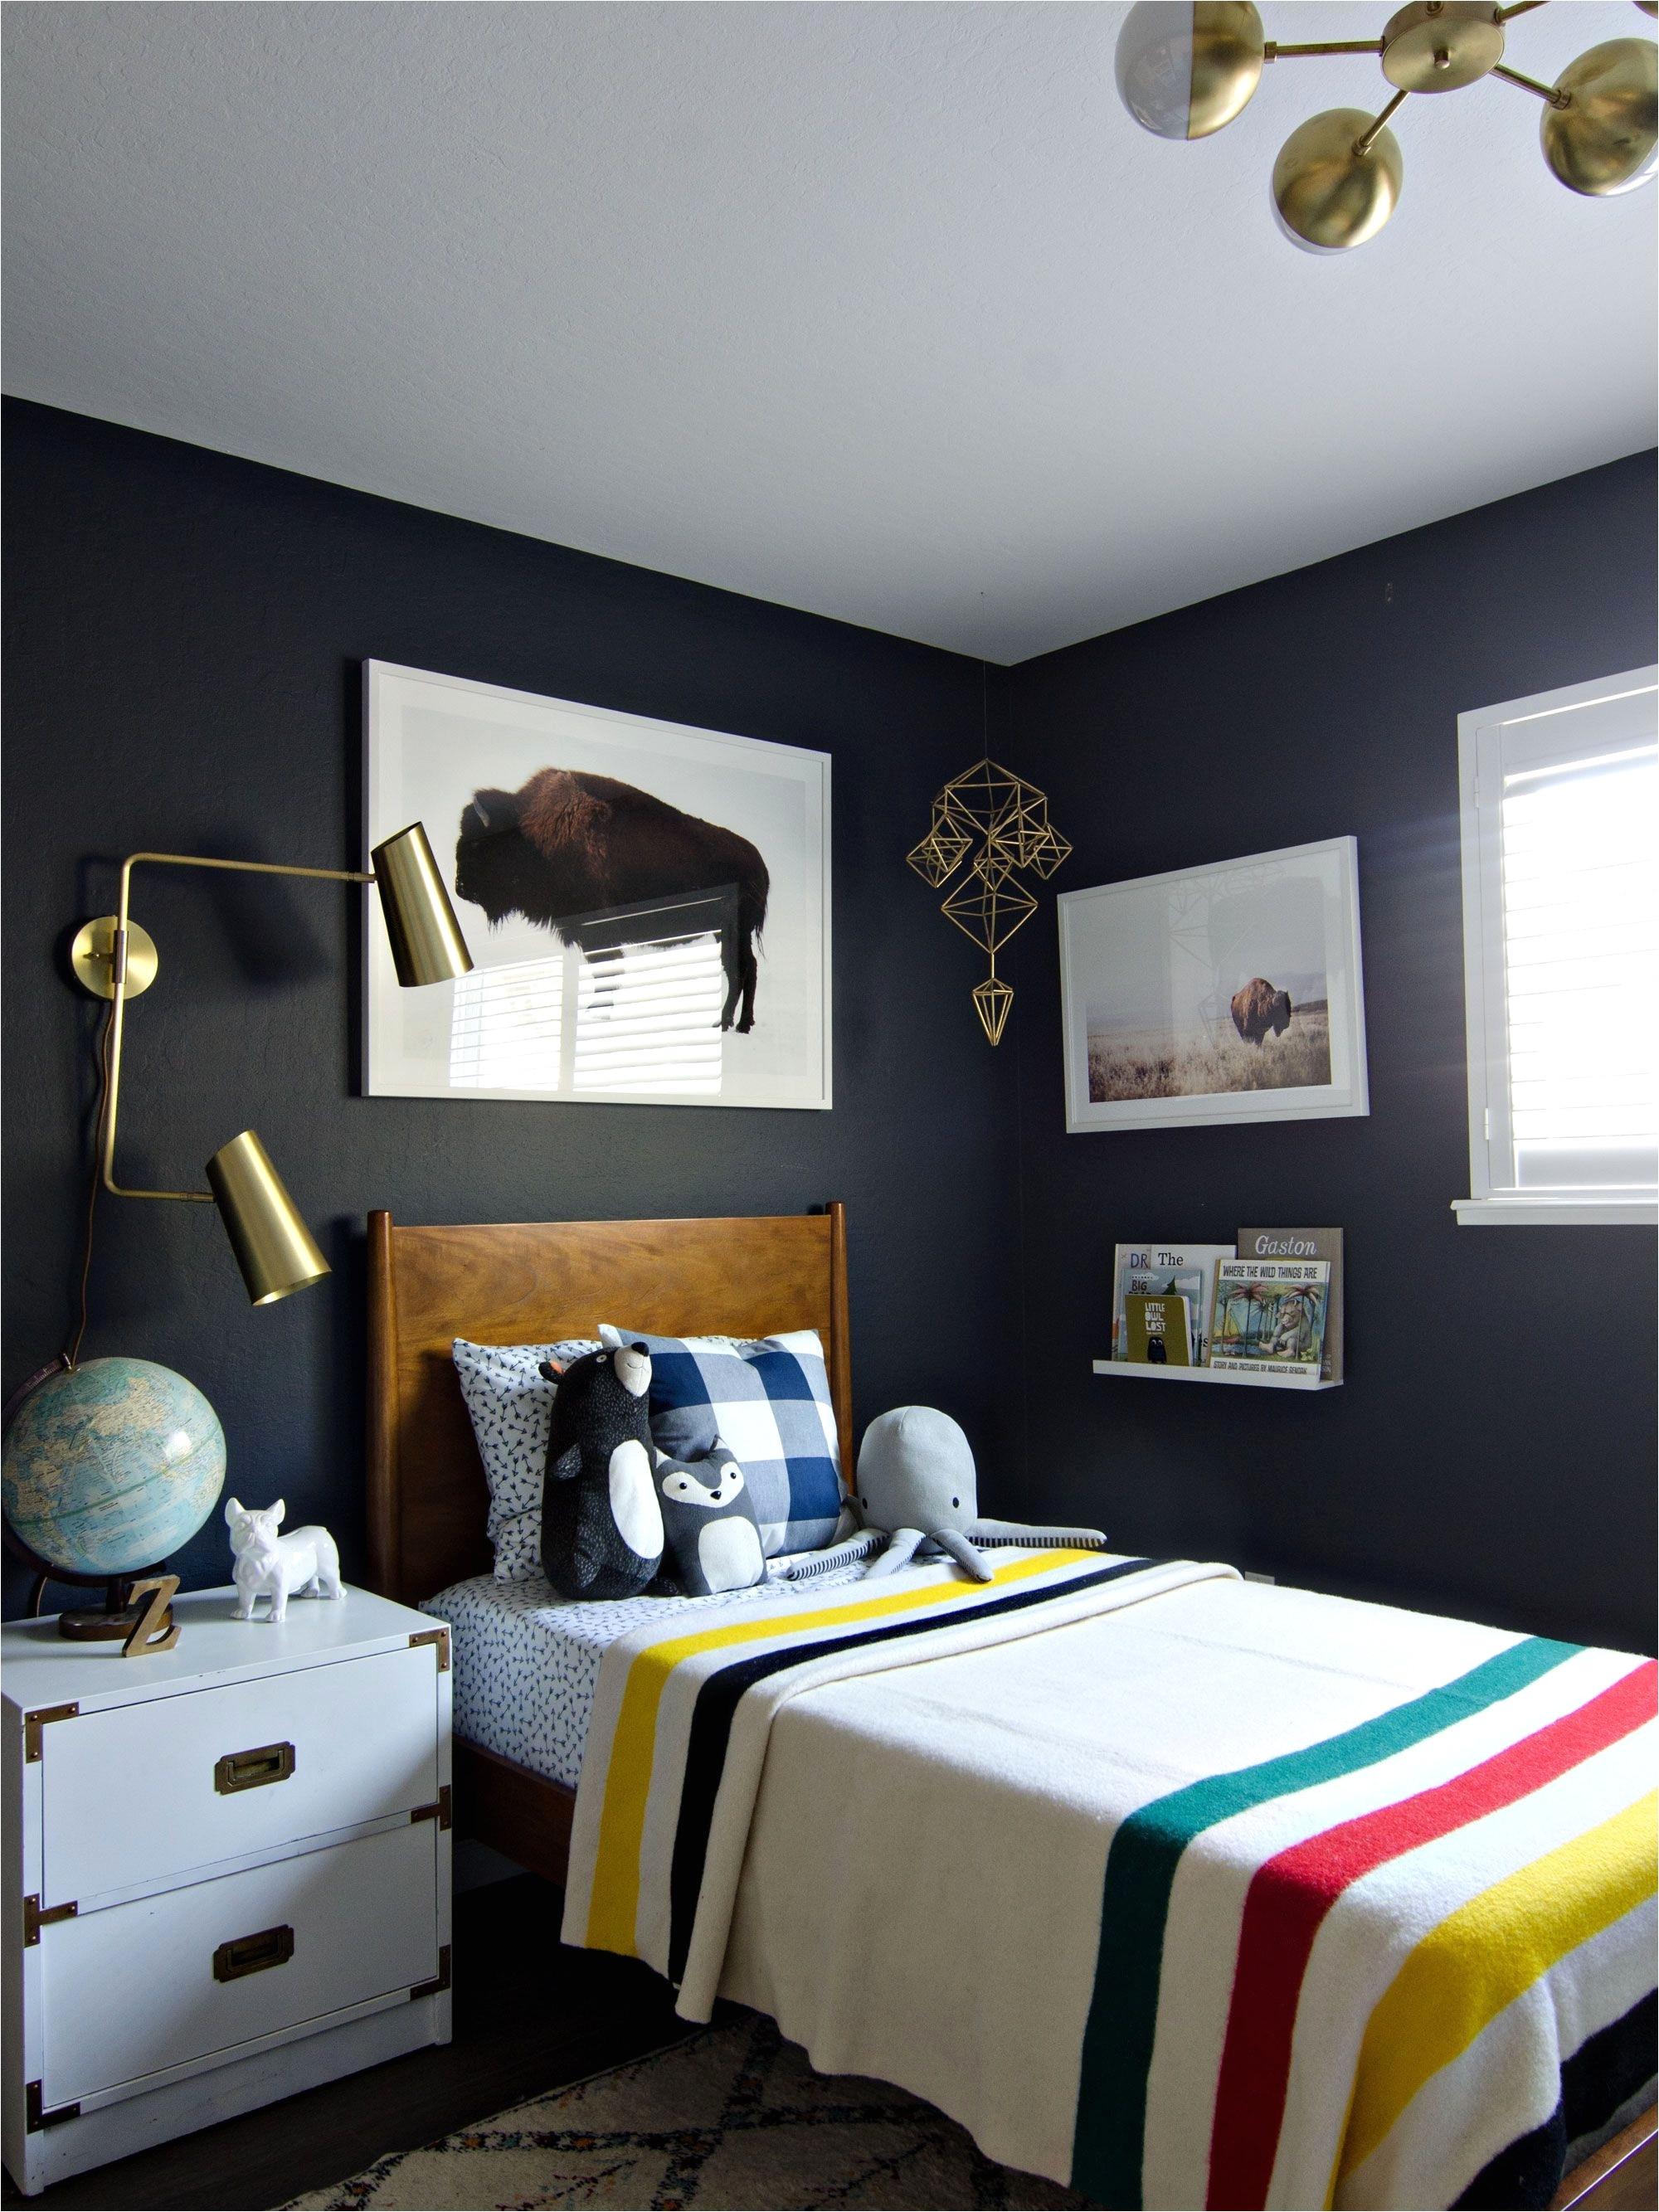 Wall Decoration Ideas For Bedrooms Fresh Light Grey Small Bedroom Beautiful Media Cache Ec0 Pinimg 736x Cd 0d